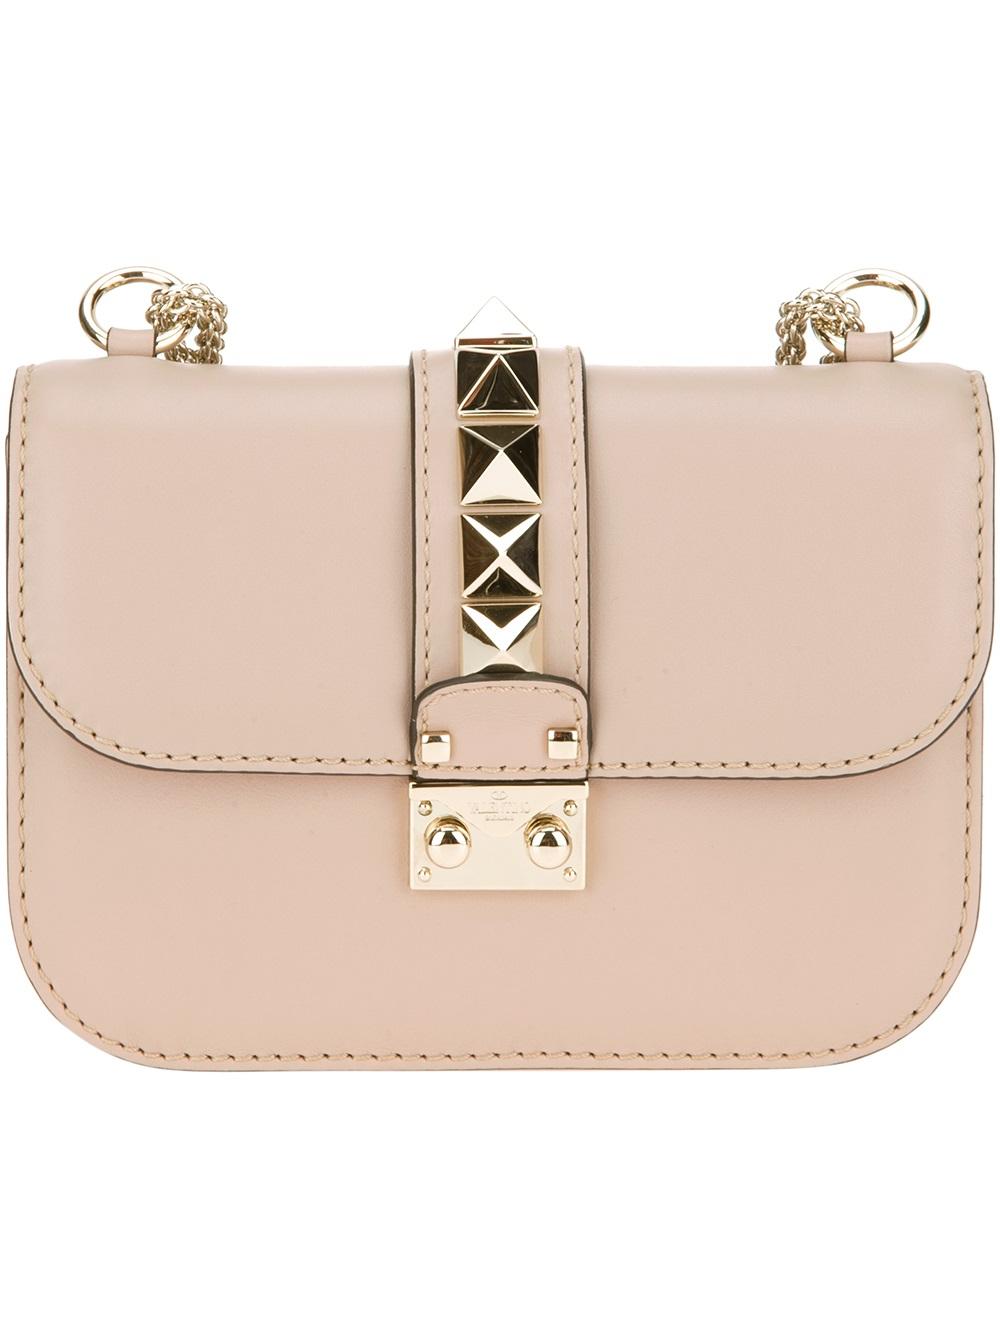 5a7b7e4a5d3 Valentino Rockstud Pochette in Pink - Lyst